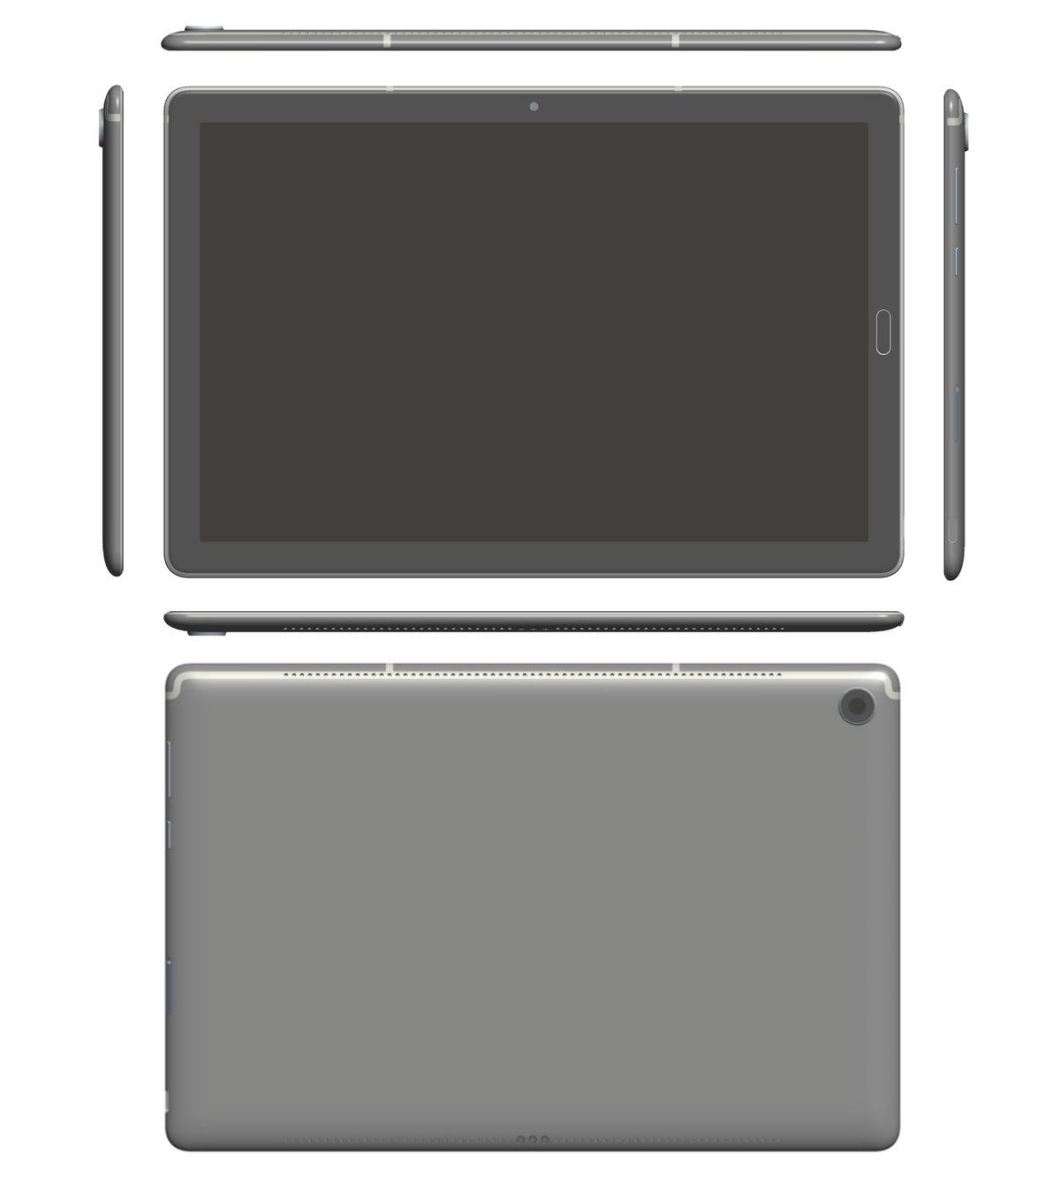 Huawei MediaPad M5 10.1